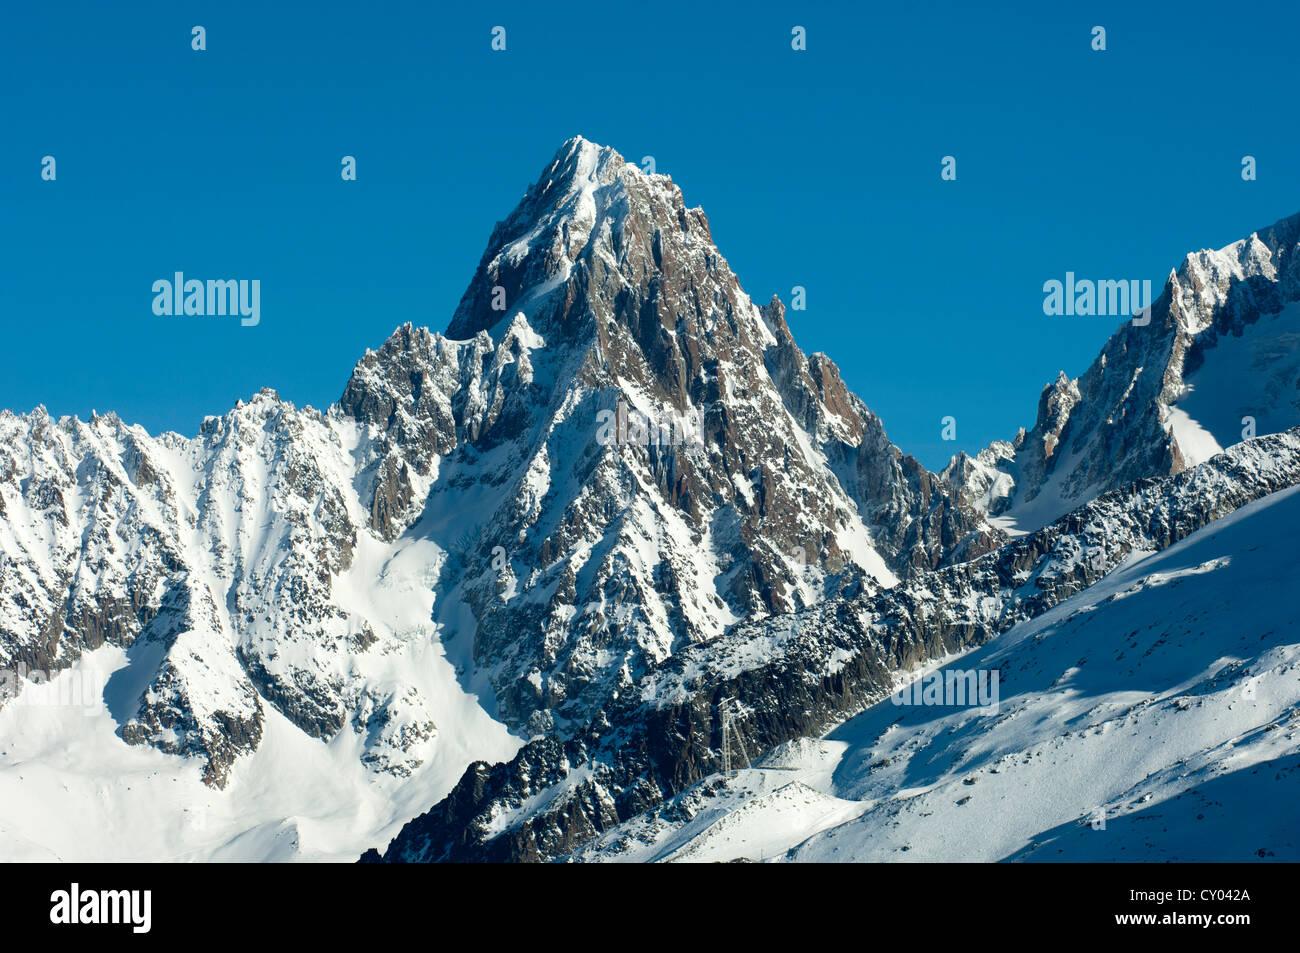 Aiguille du Chardonnet mountain in winter, Chamonix, Haute Savoie, France, Europe - Stock Image